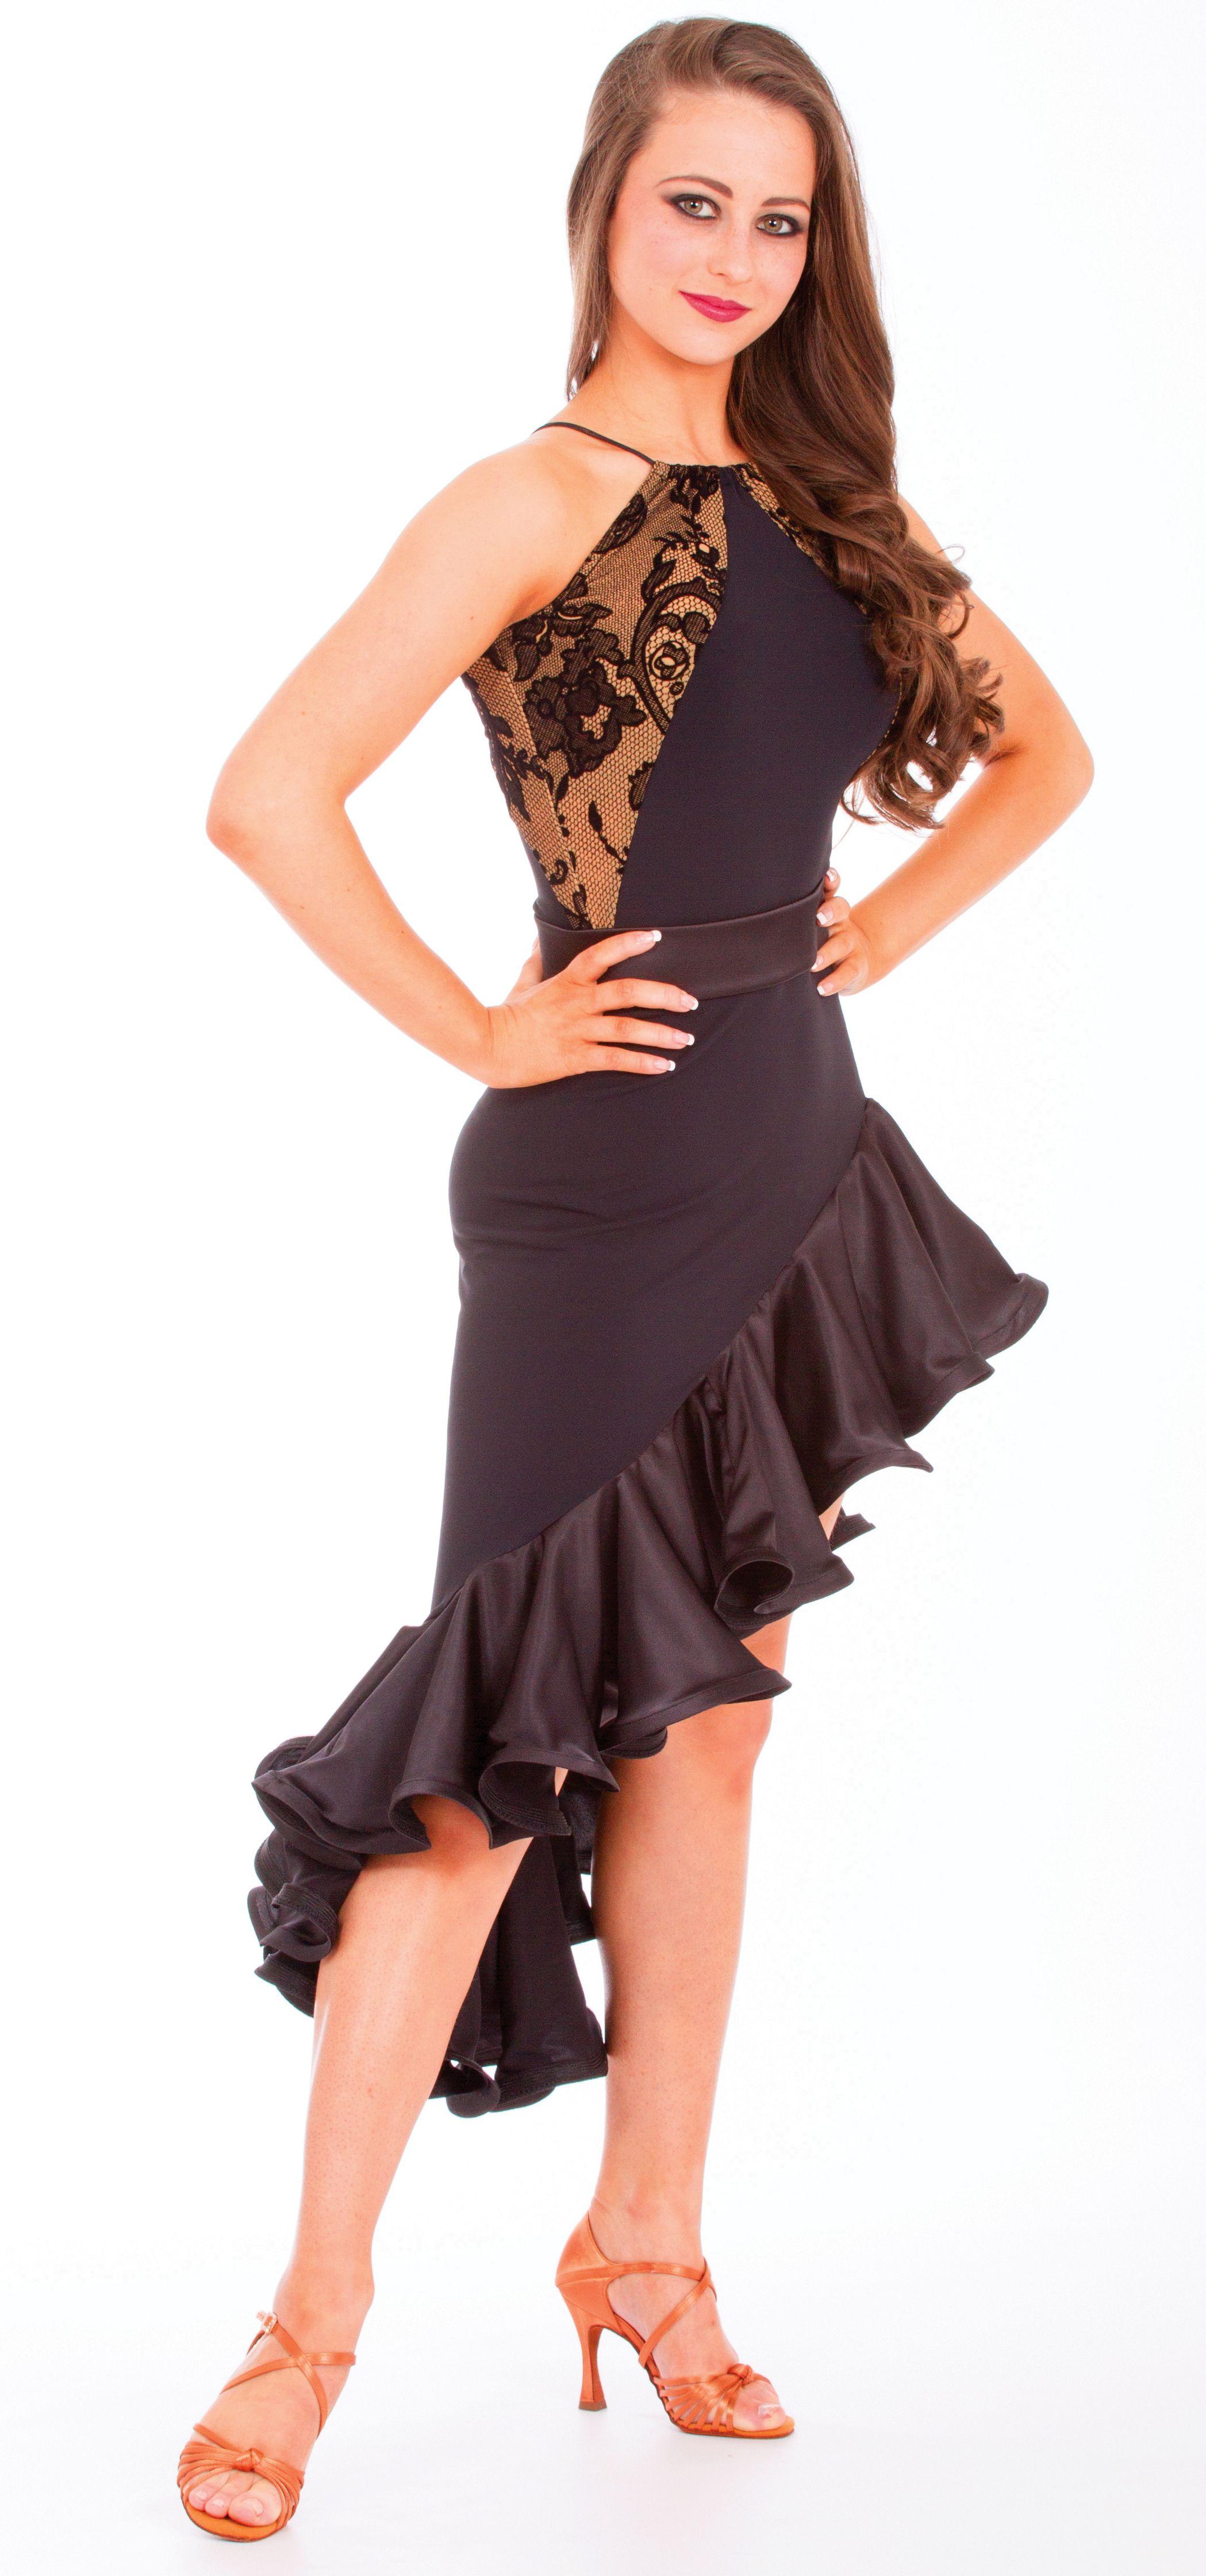 New Latin Salsa Tango Ballroom Dance Dress Evening Party Dress S M L ...